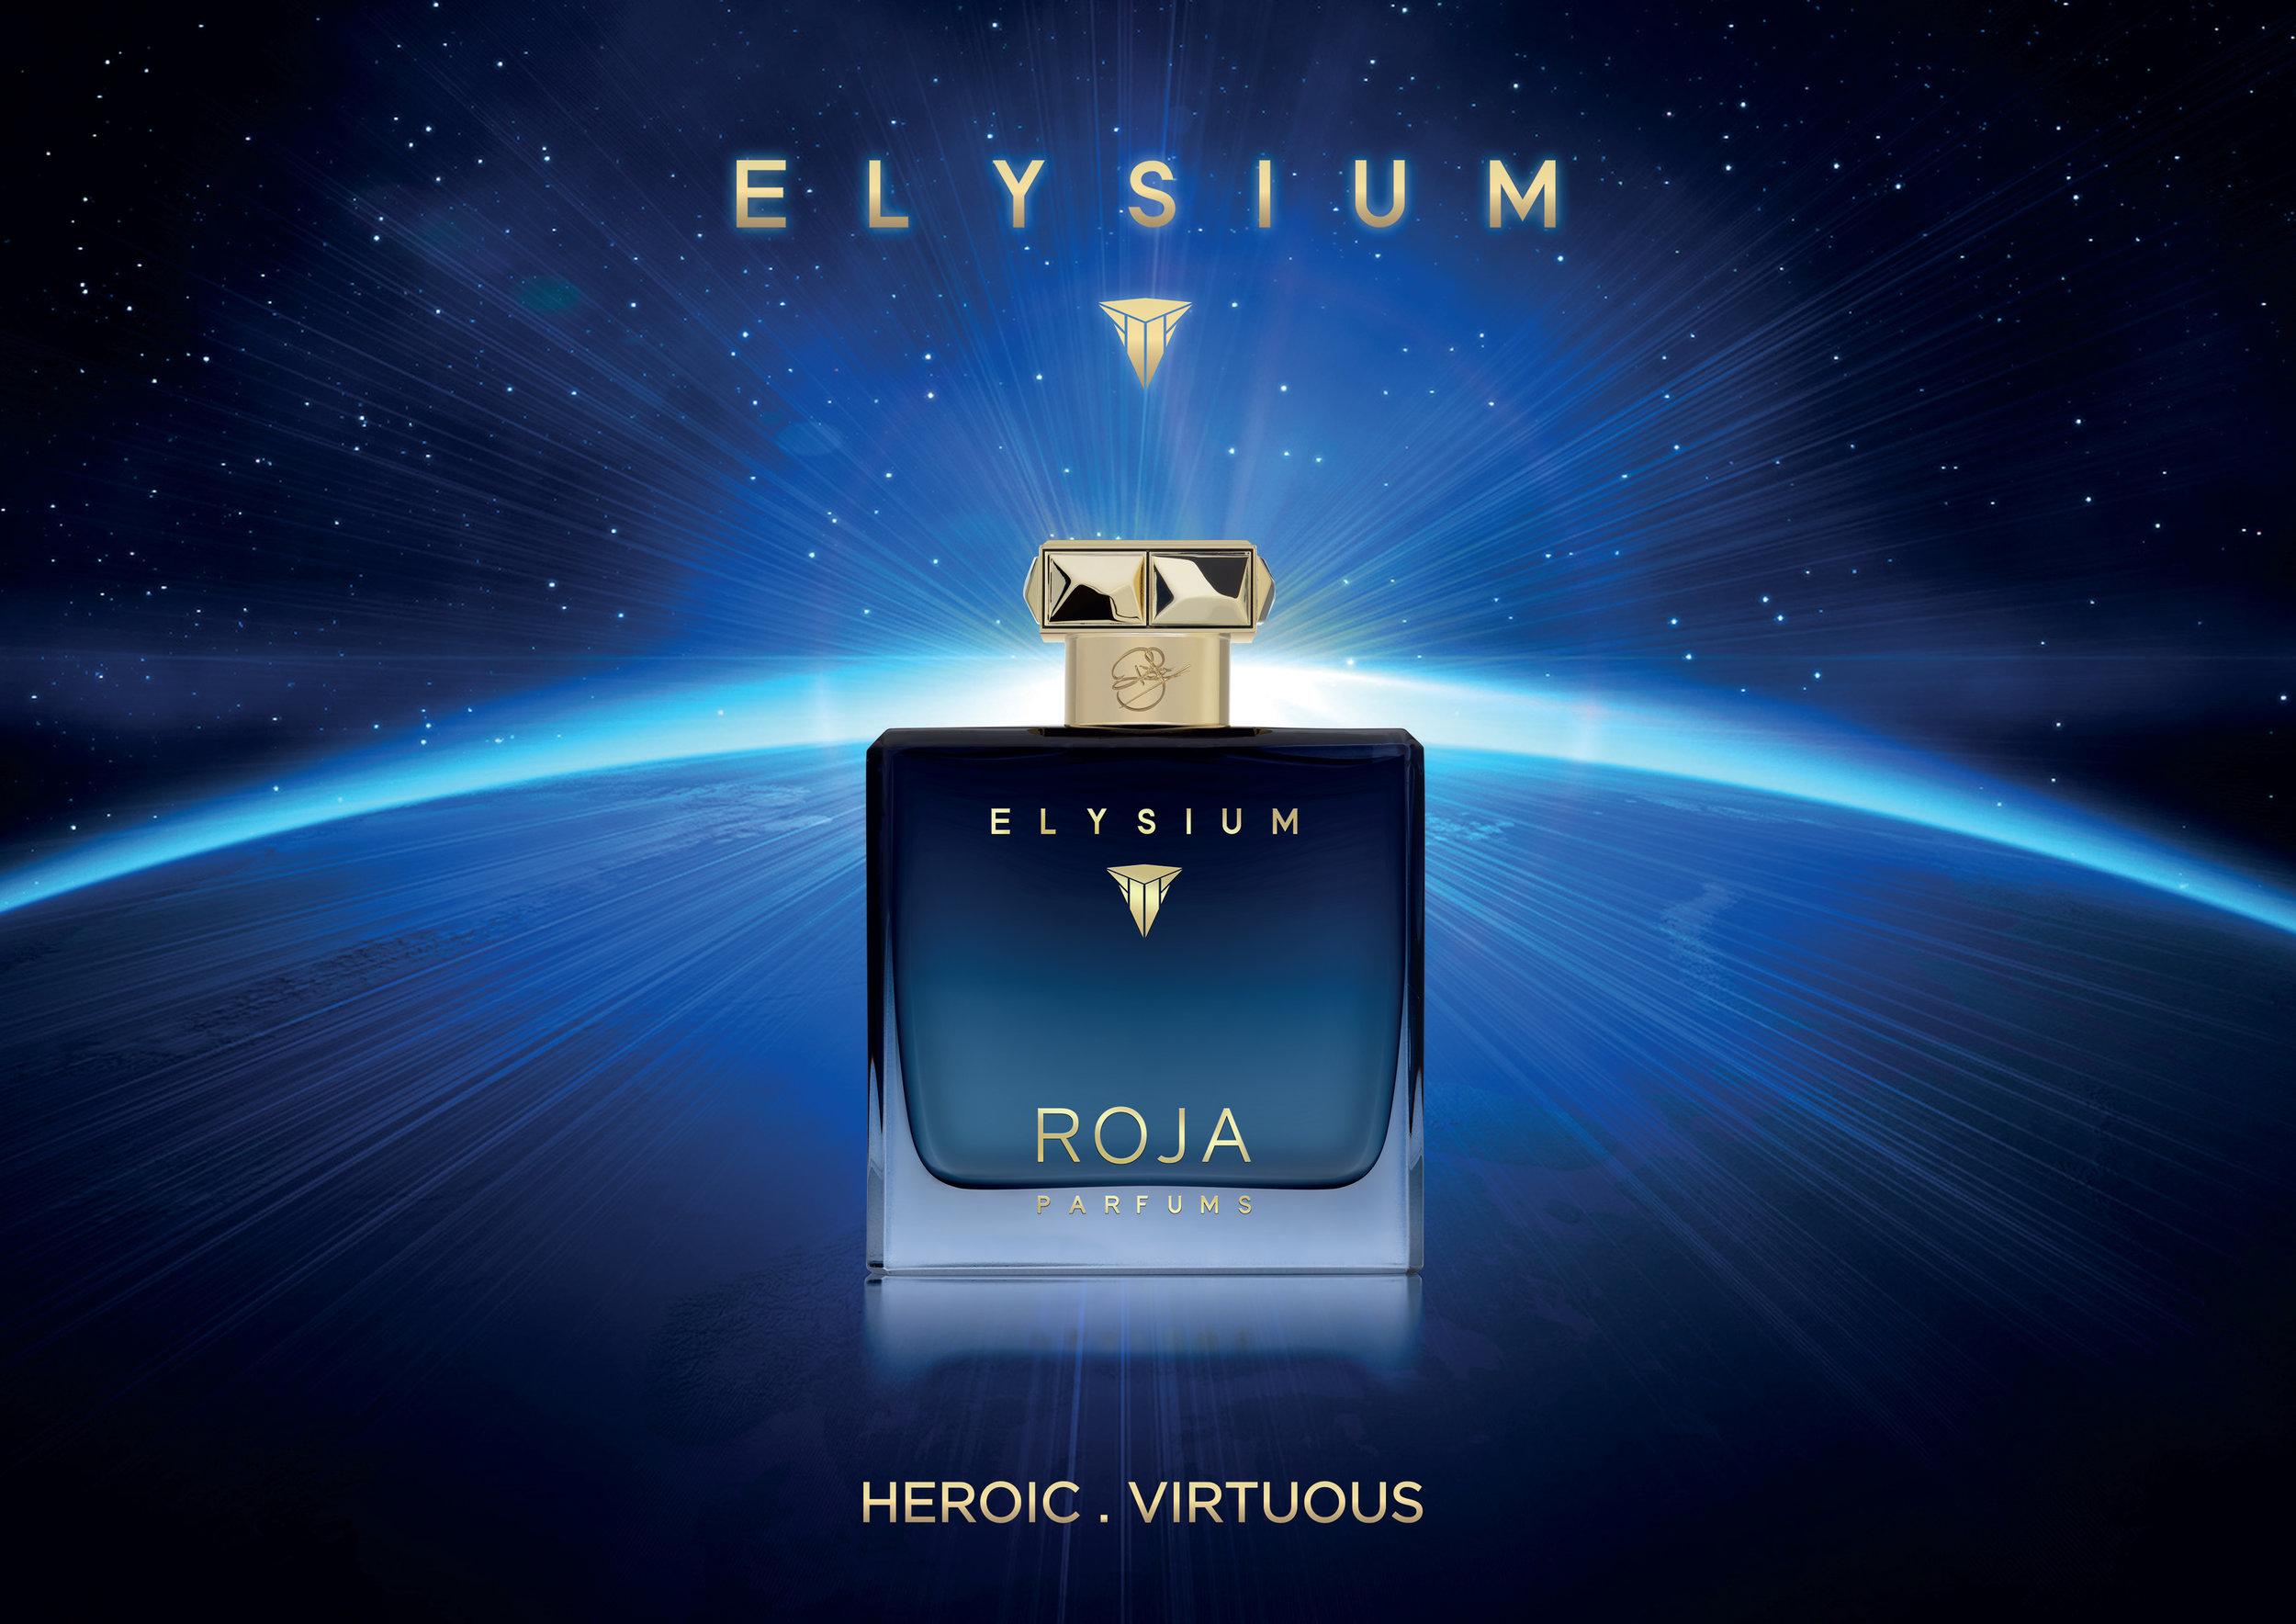 roja-dove-perfums_elysium-advert_scorpio-worldwide_travel-retail-distributor